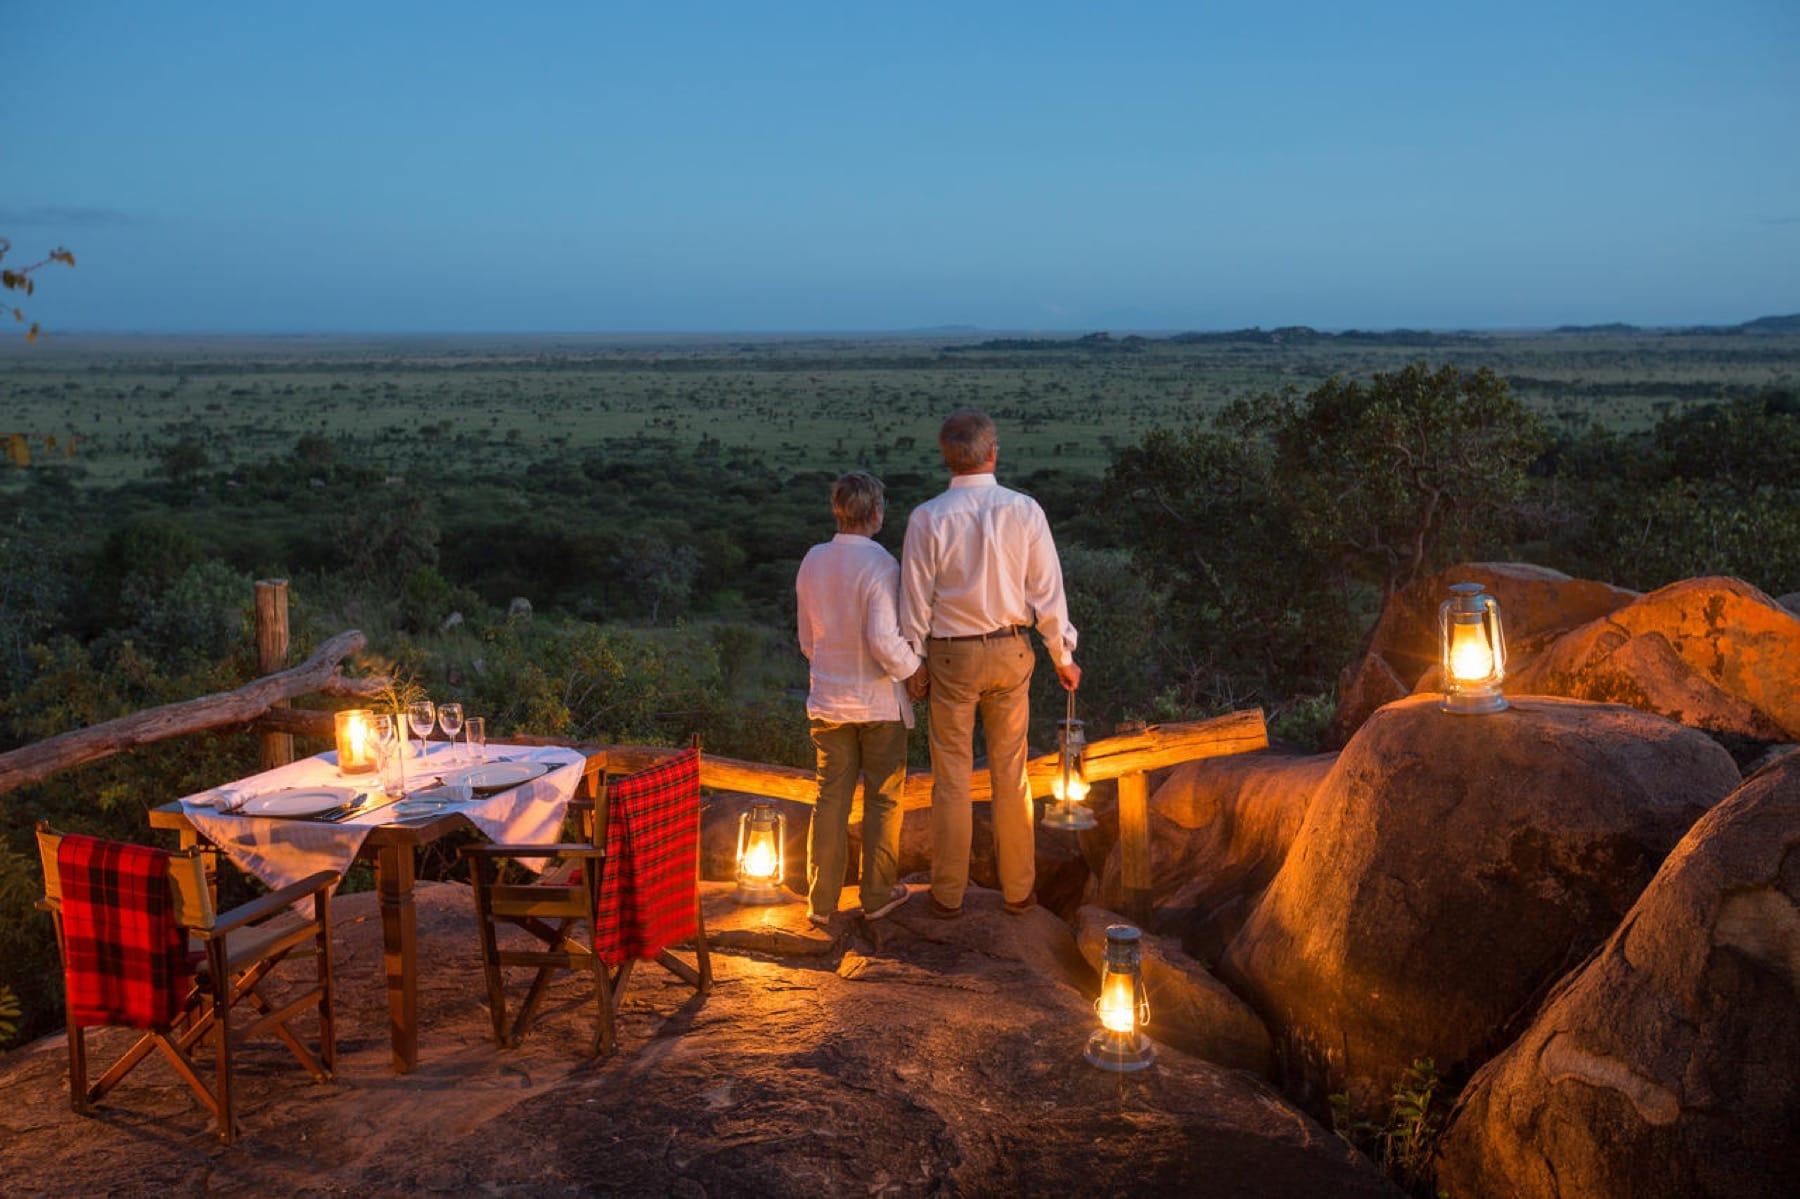 Couples overlooking the Serengeti Plains Credit: Wetu.com